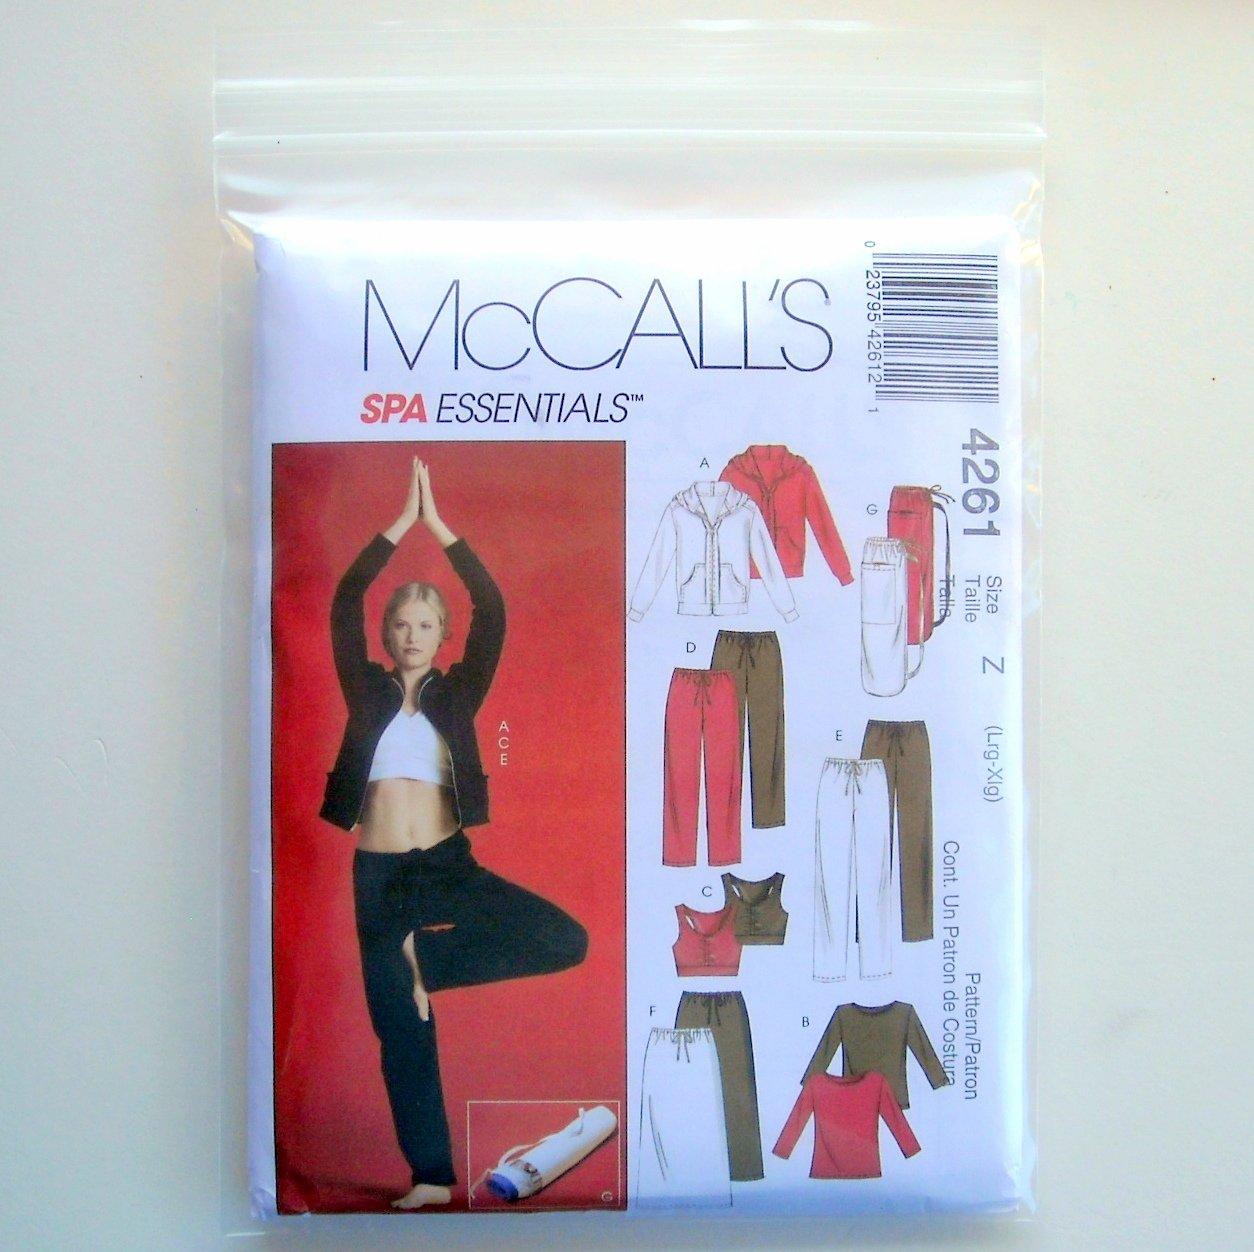 Misses Spa Essentials Jacket Top Bra Pants Skirt Bag Lrg Xlg McCalls Sewing Pattern 4261